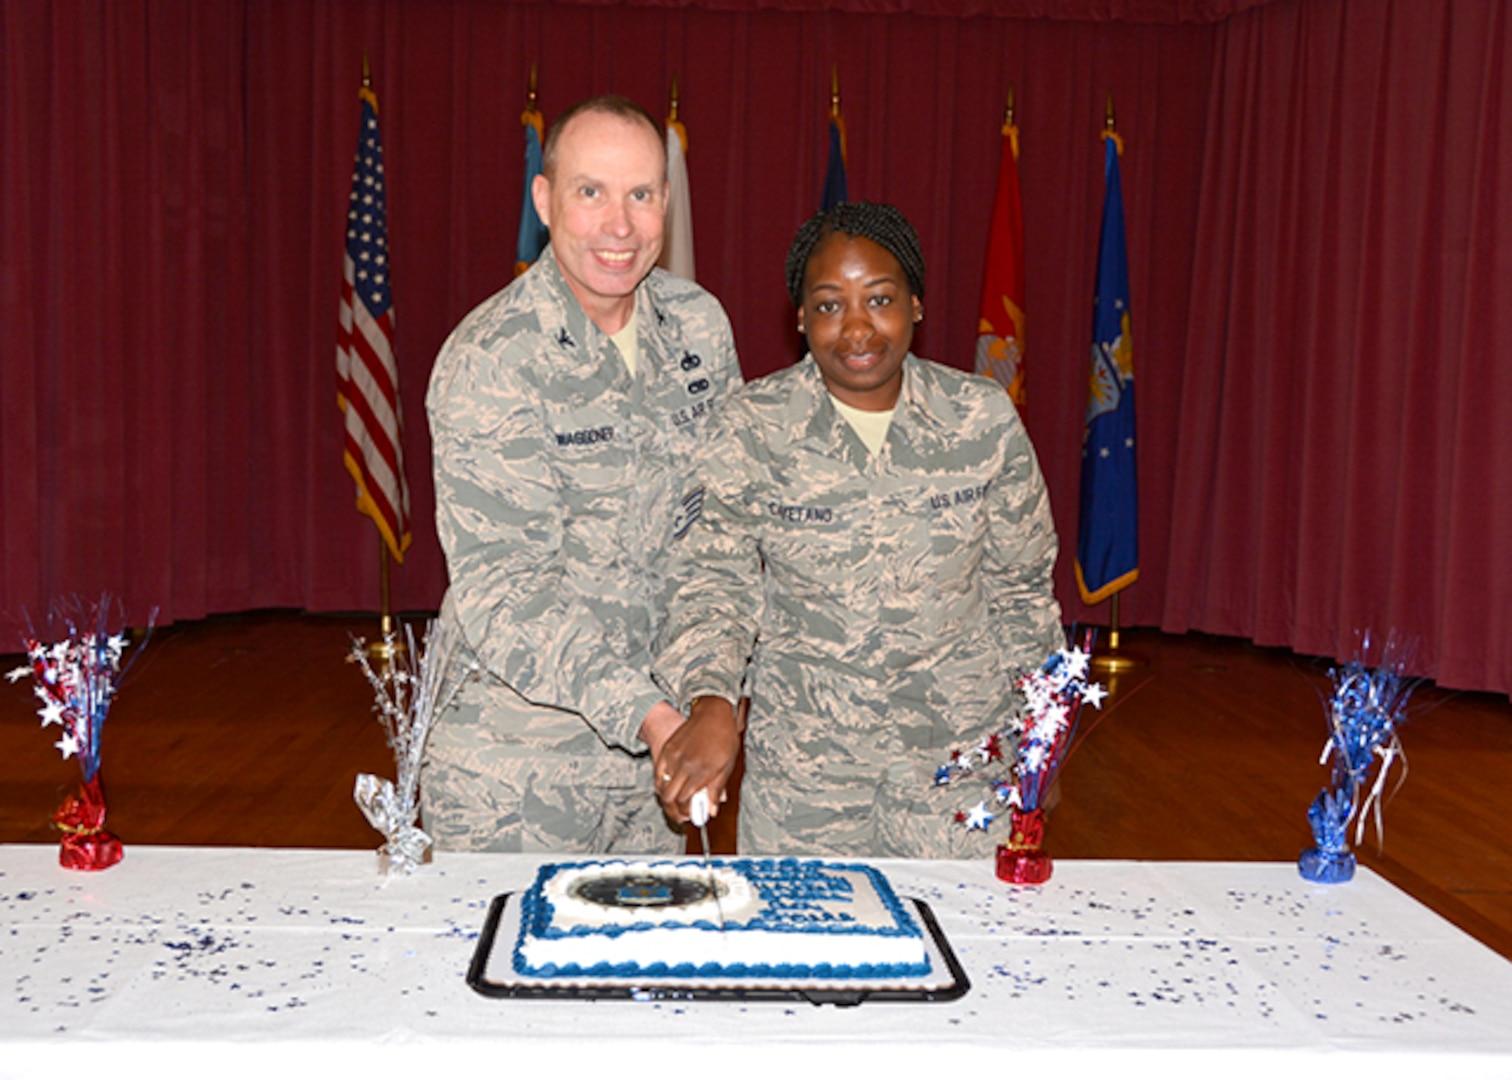 DLA celebrates the Air Force's 71st birthday!